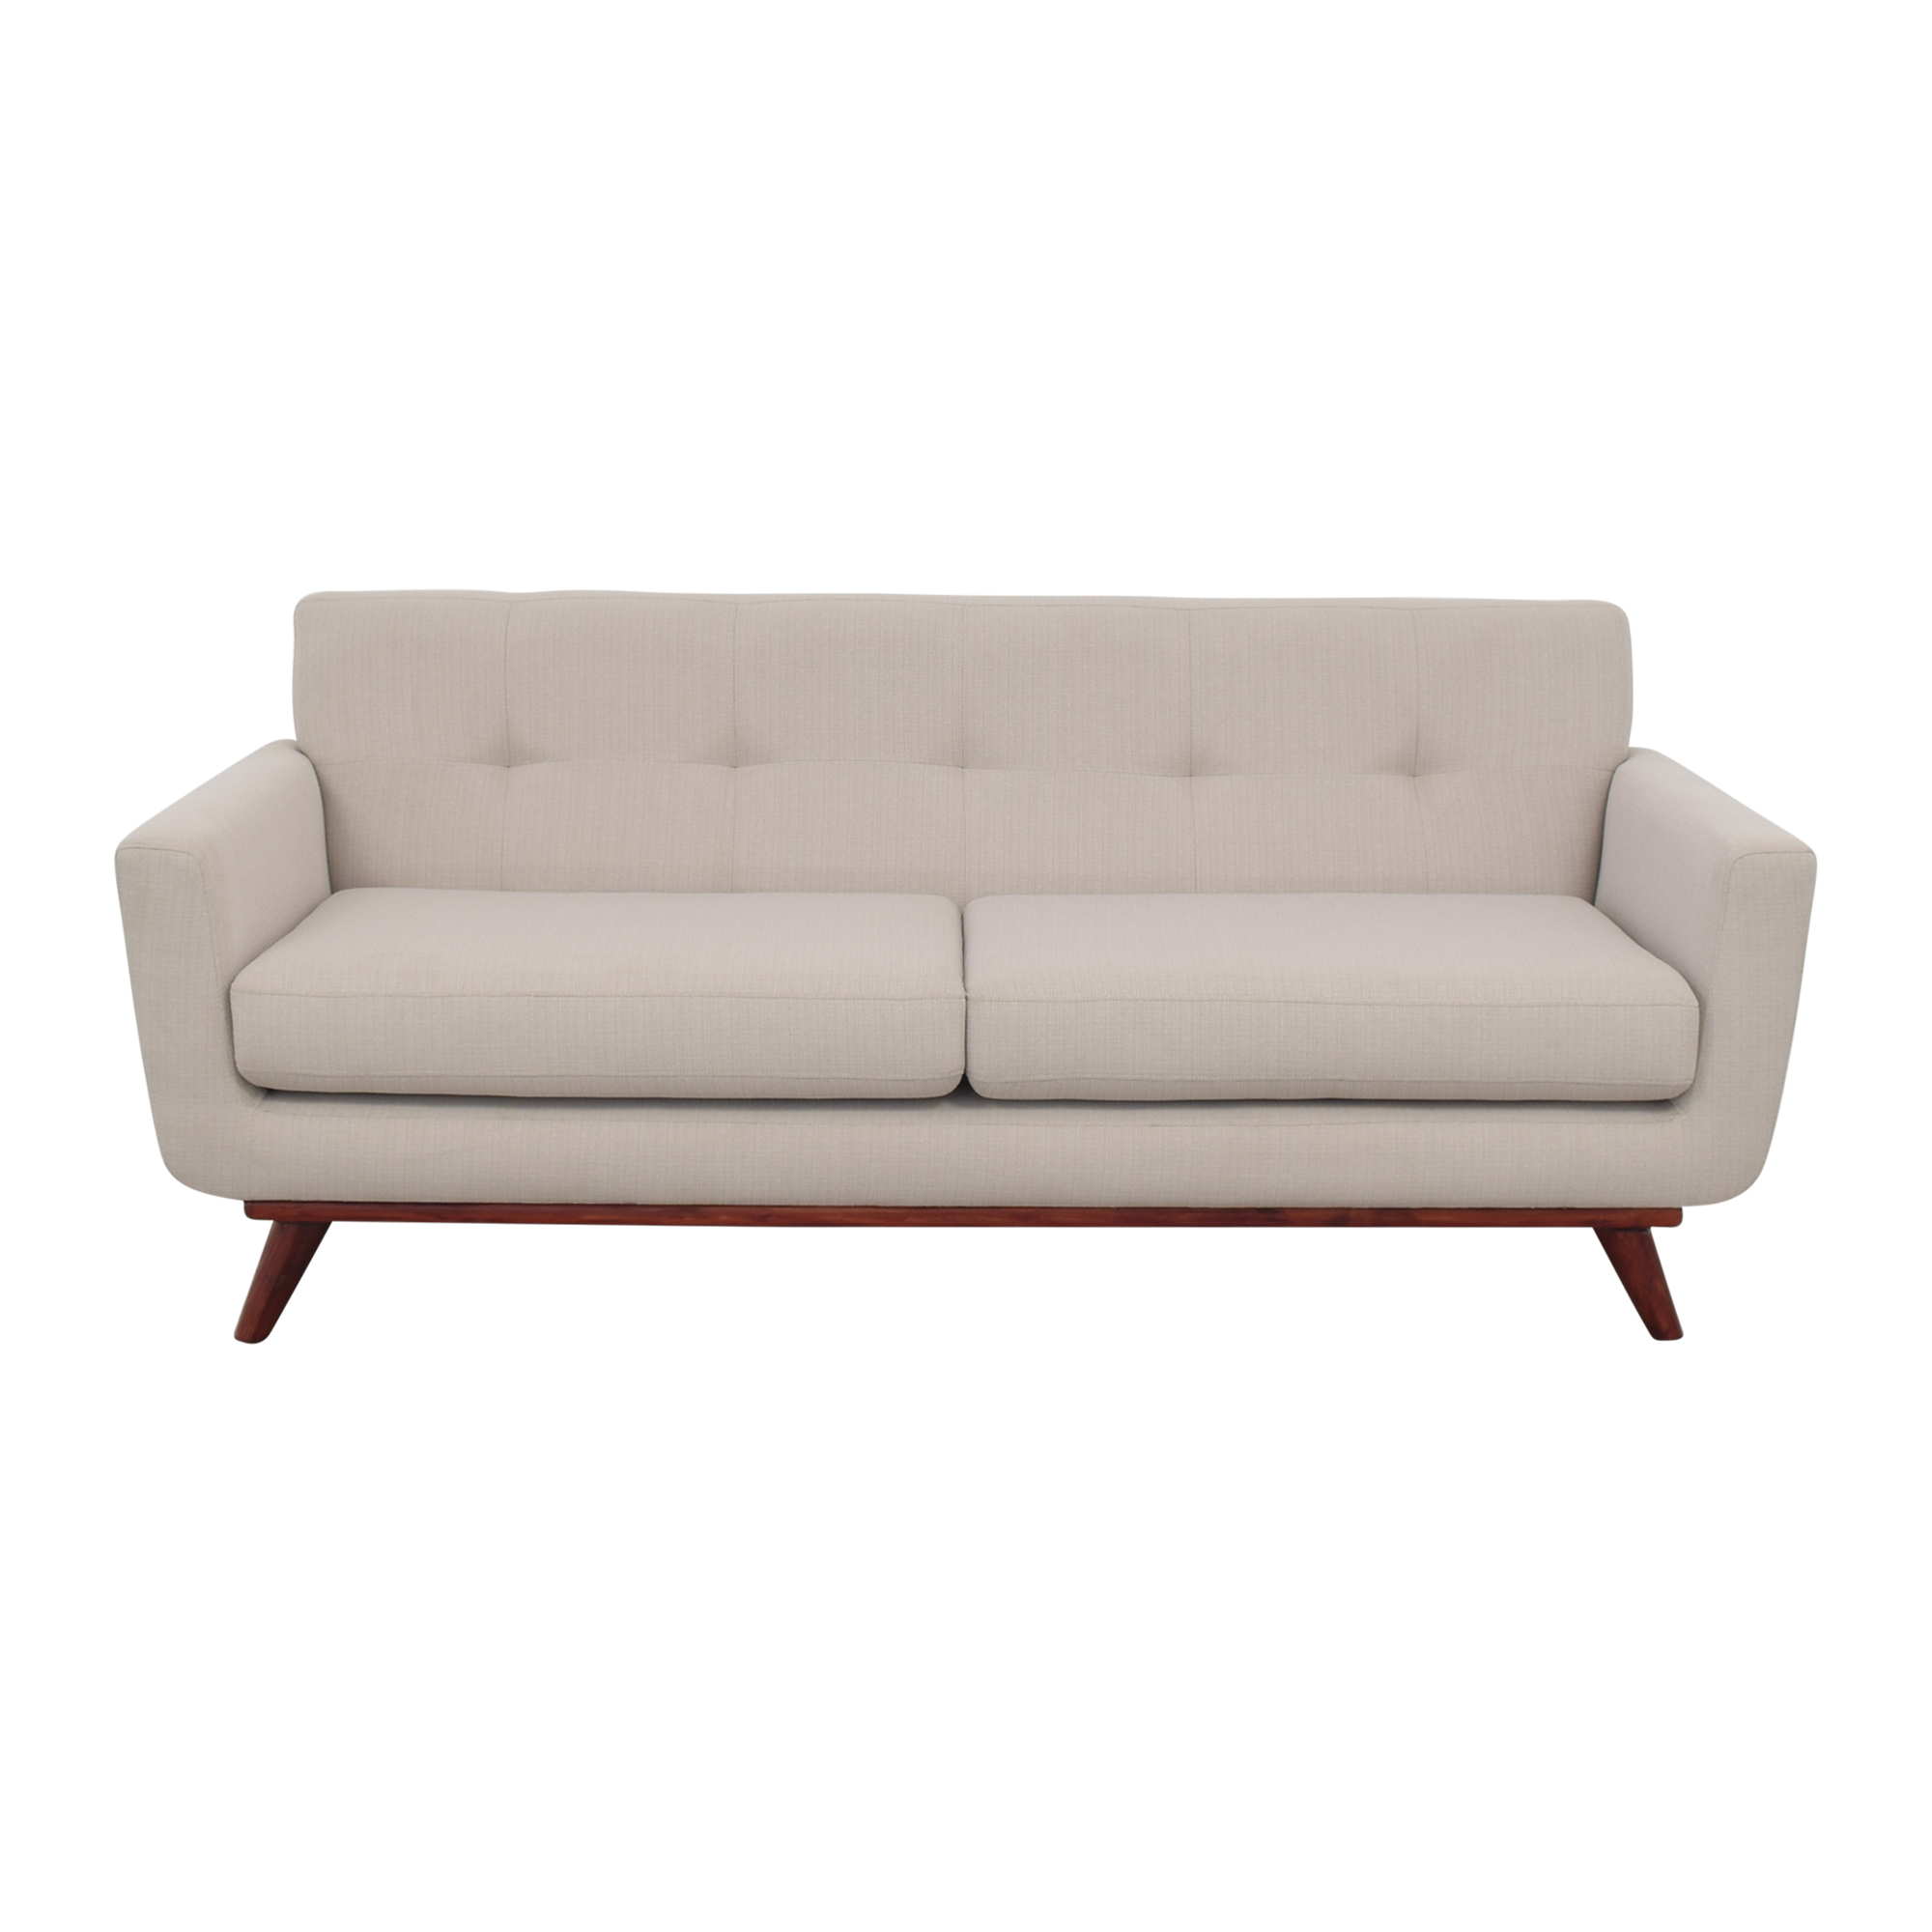 Bagley Road Charlie Two Cushion Sofa / Sofas